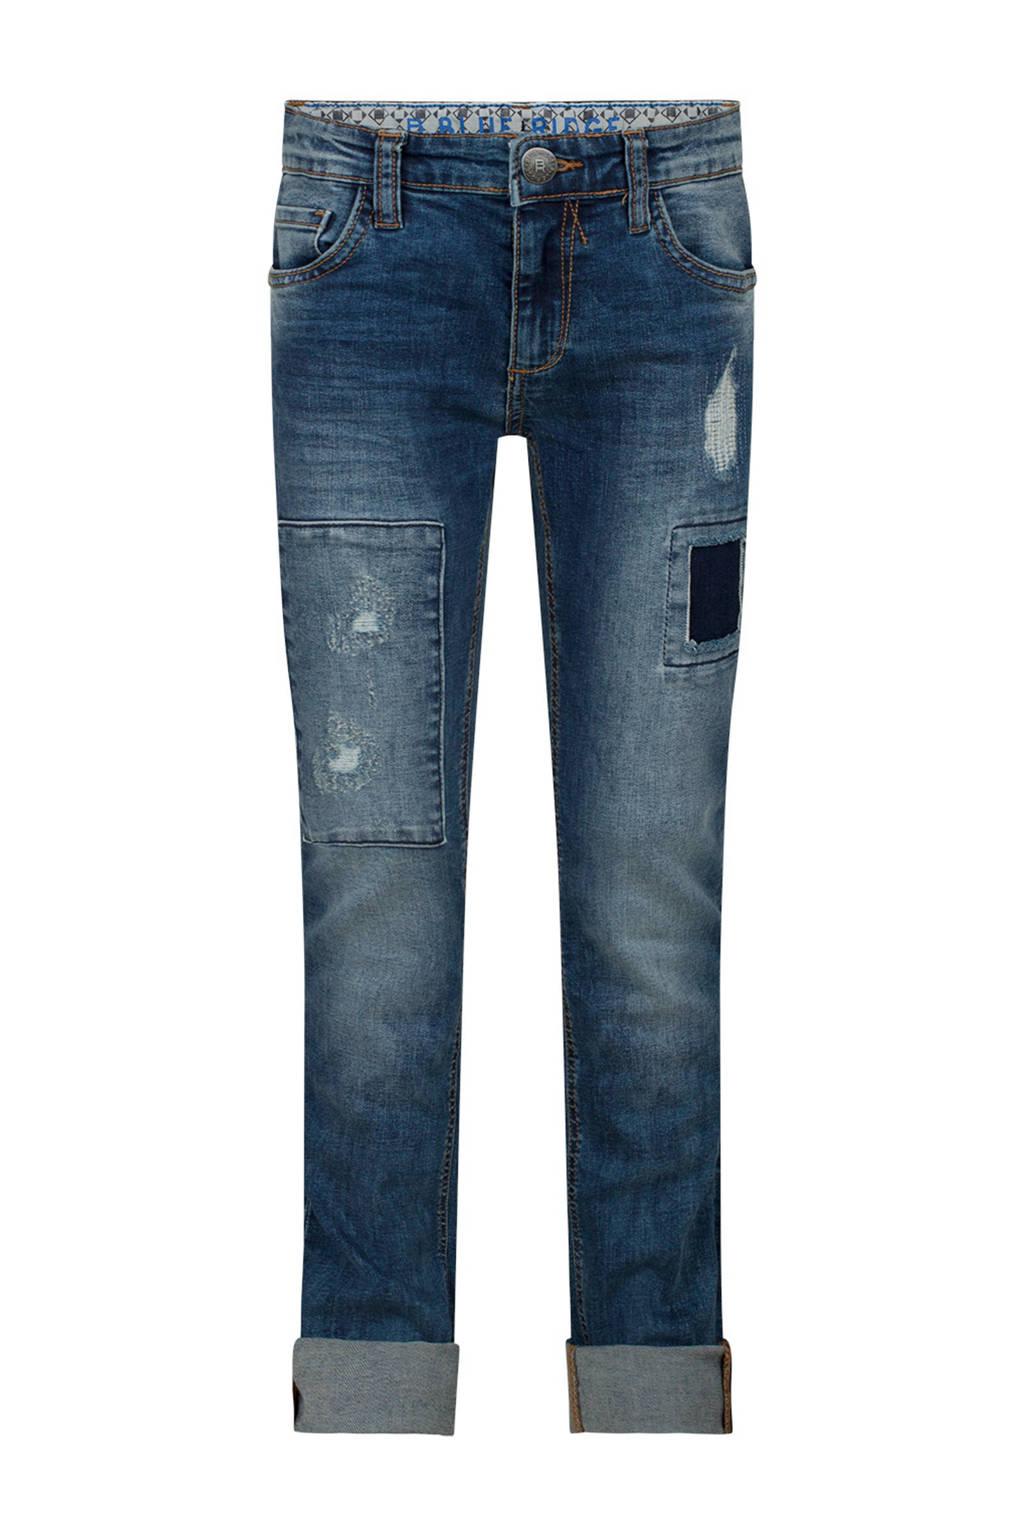 WE Fashion Blue Ridge regular skinny jeans, Blue denim